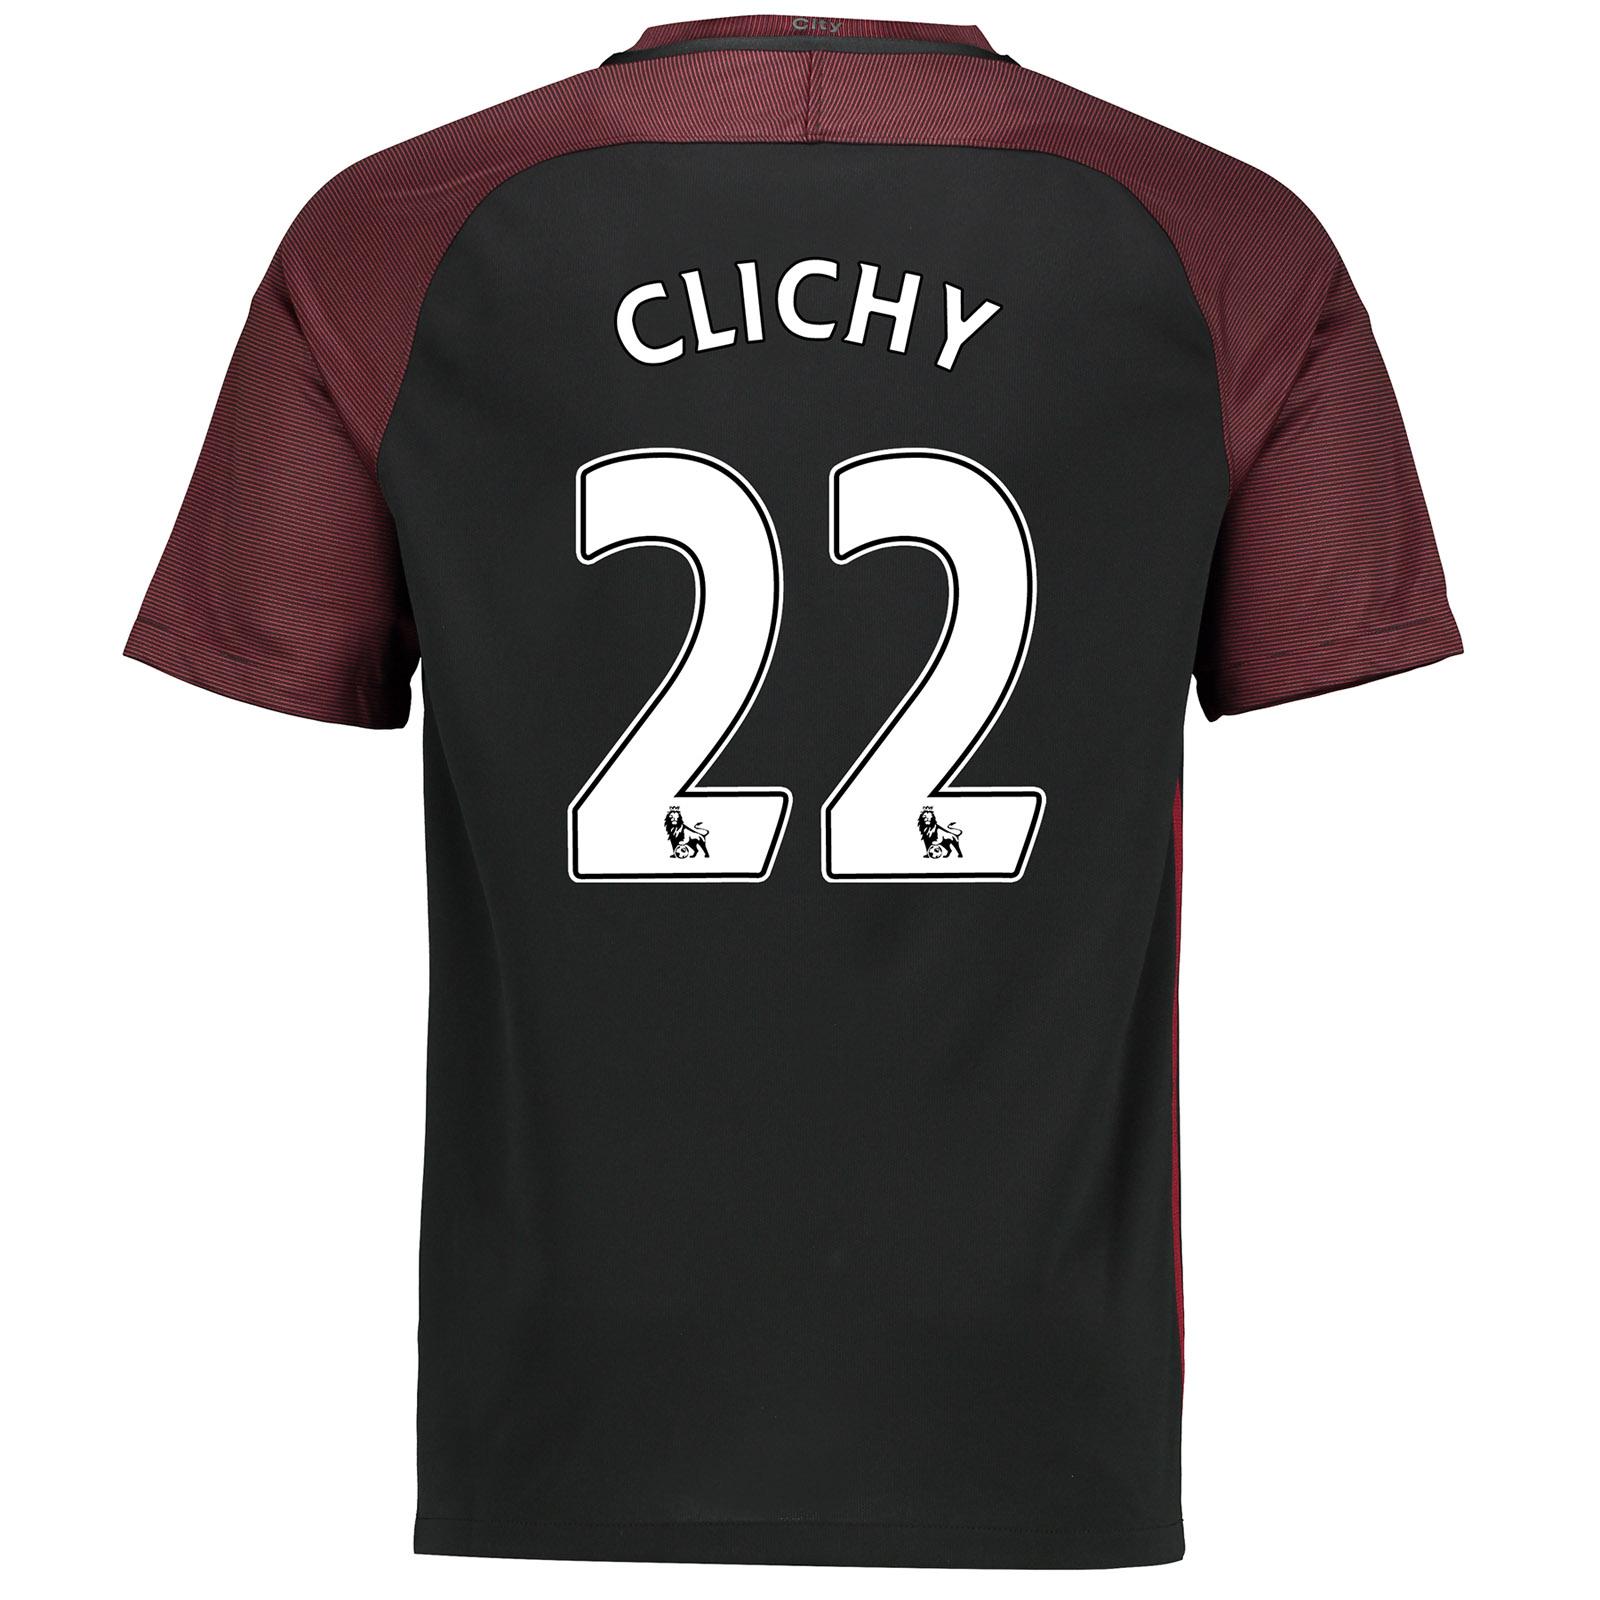 Manchester City Away Stadium Shirt 2016-17 with Clichy 22 printing